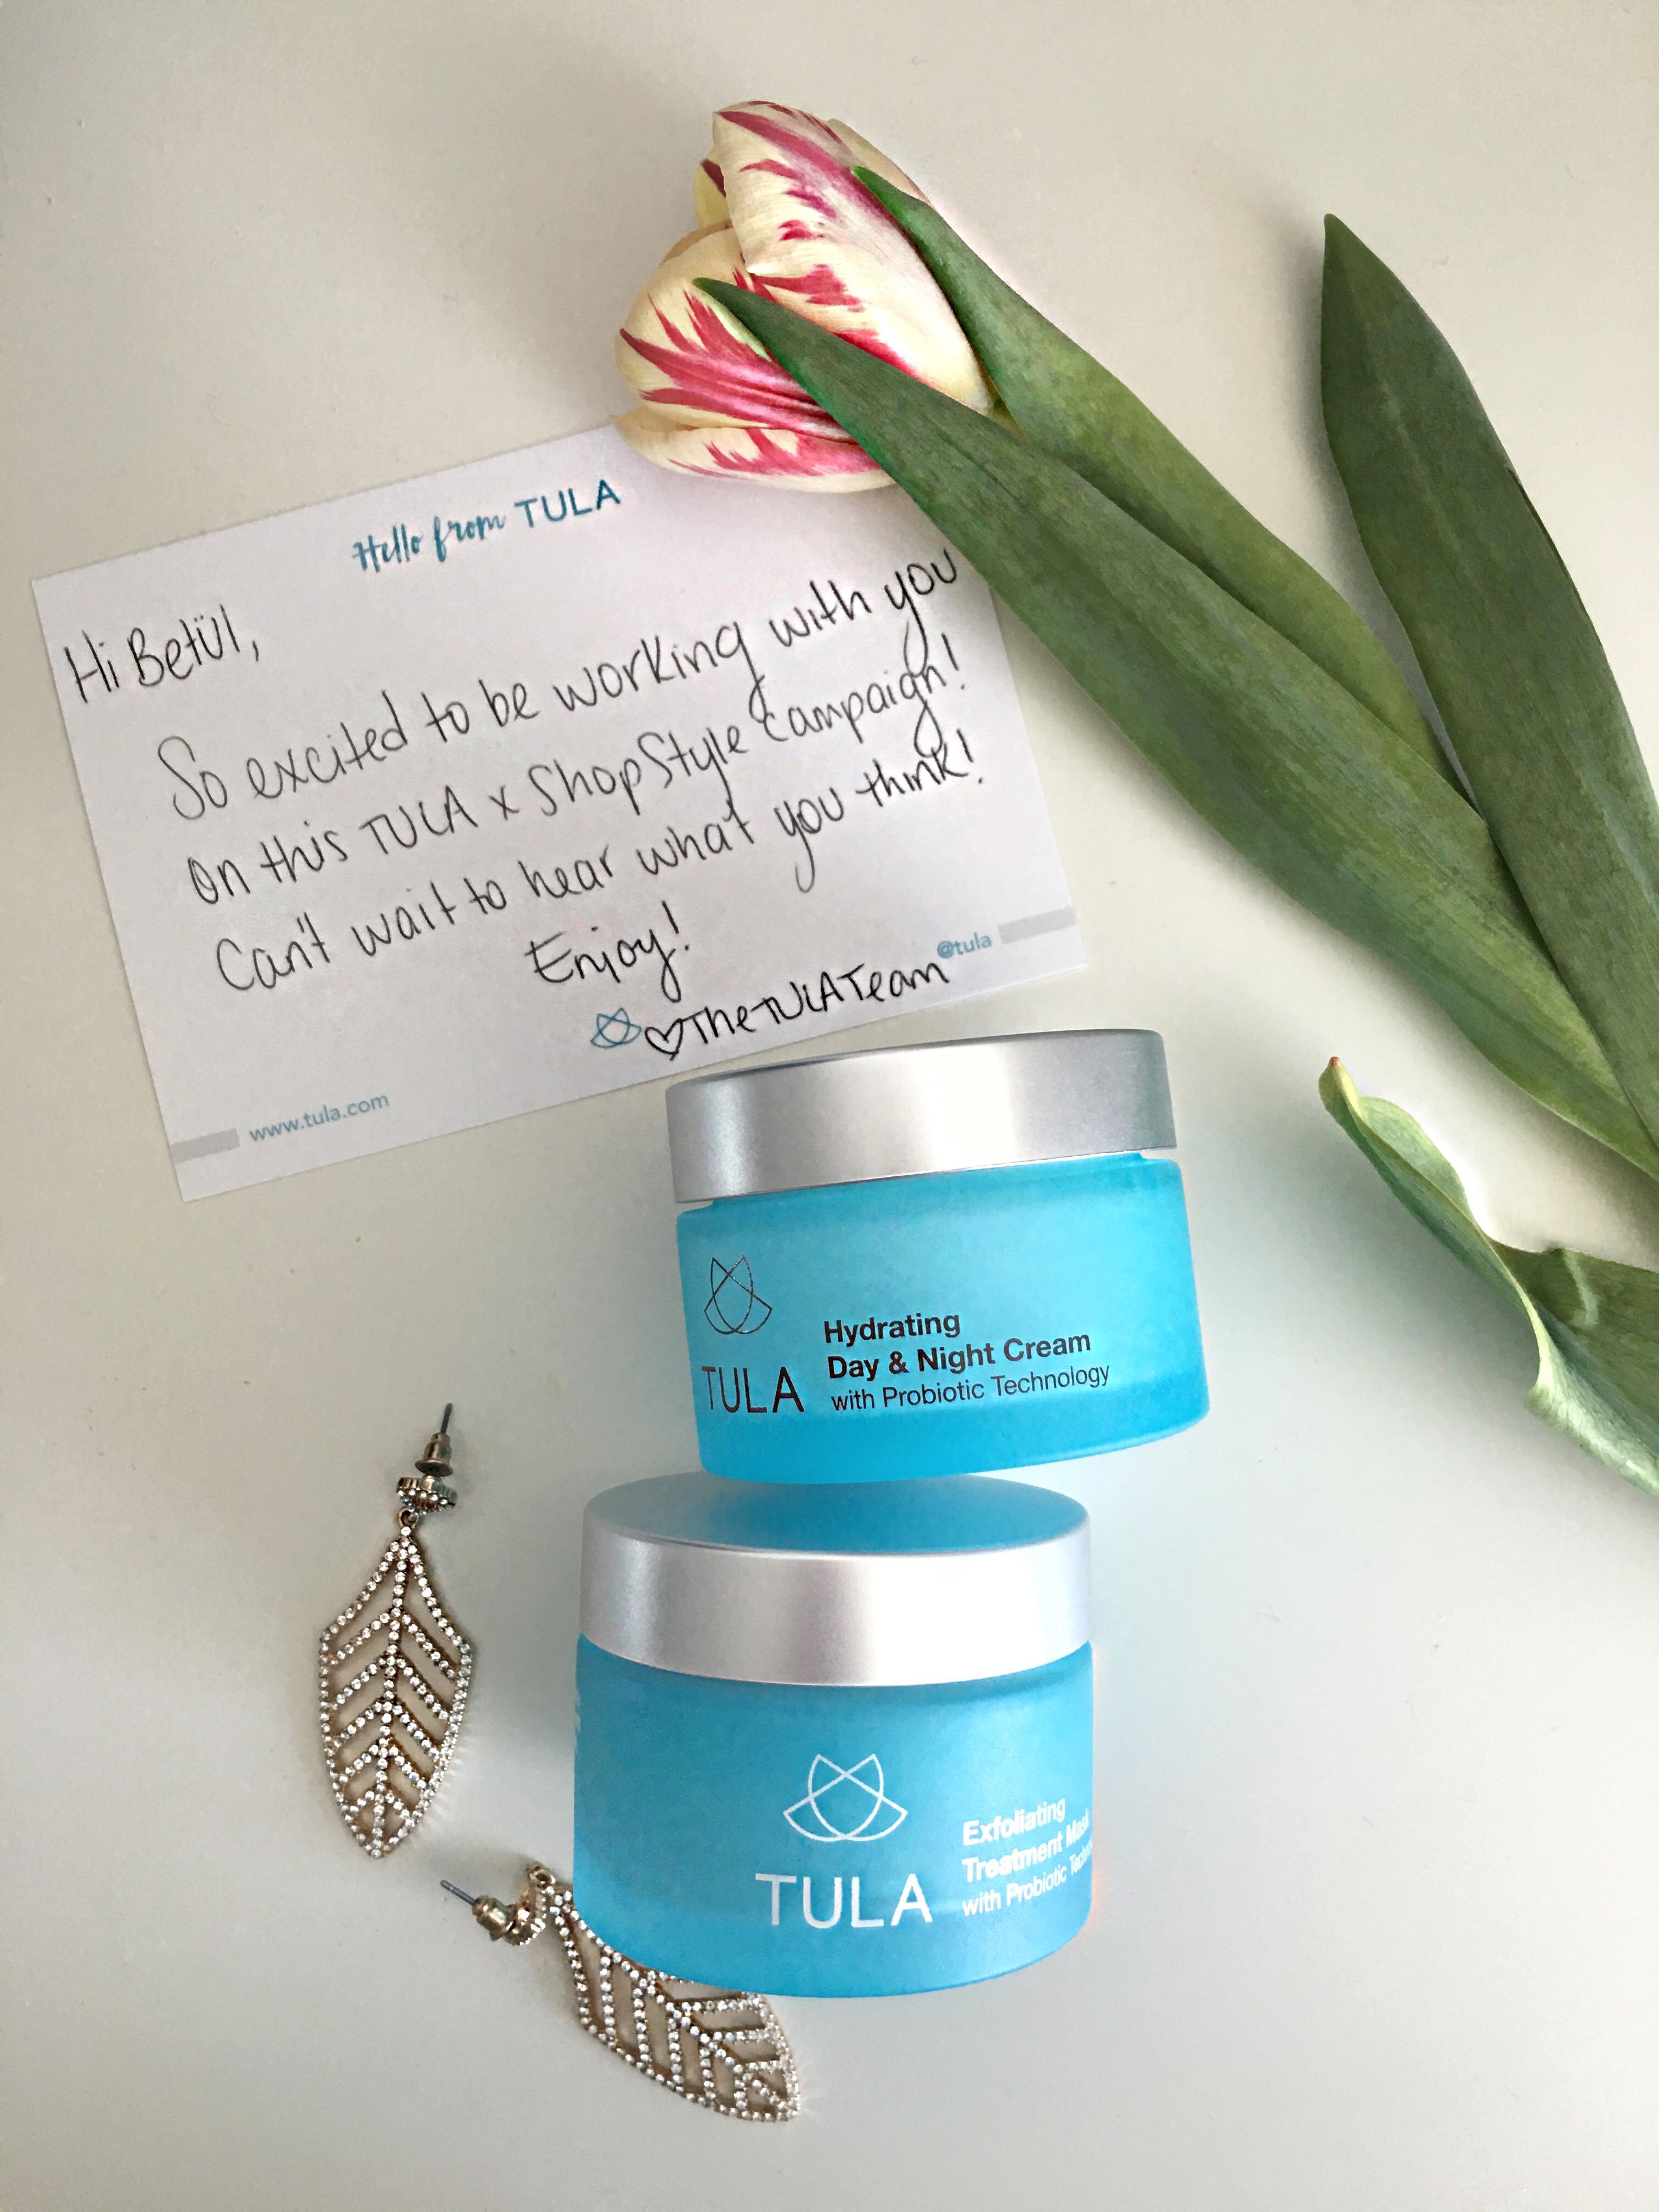 image - My New Favorite Skincare: TULA